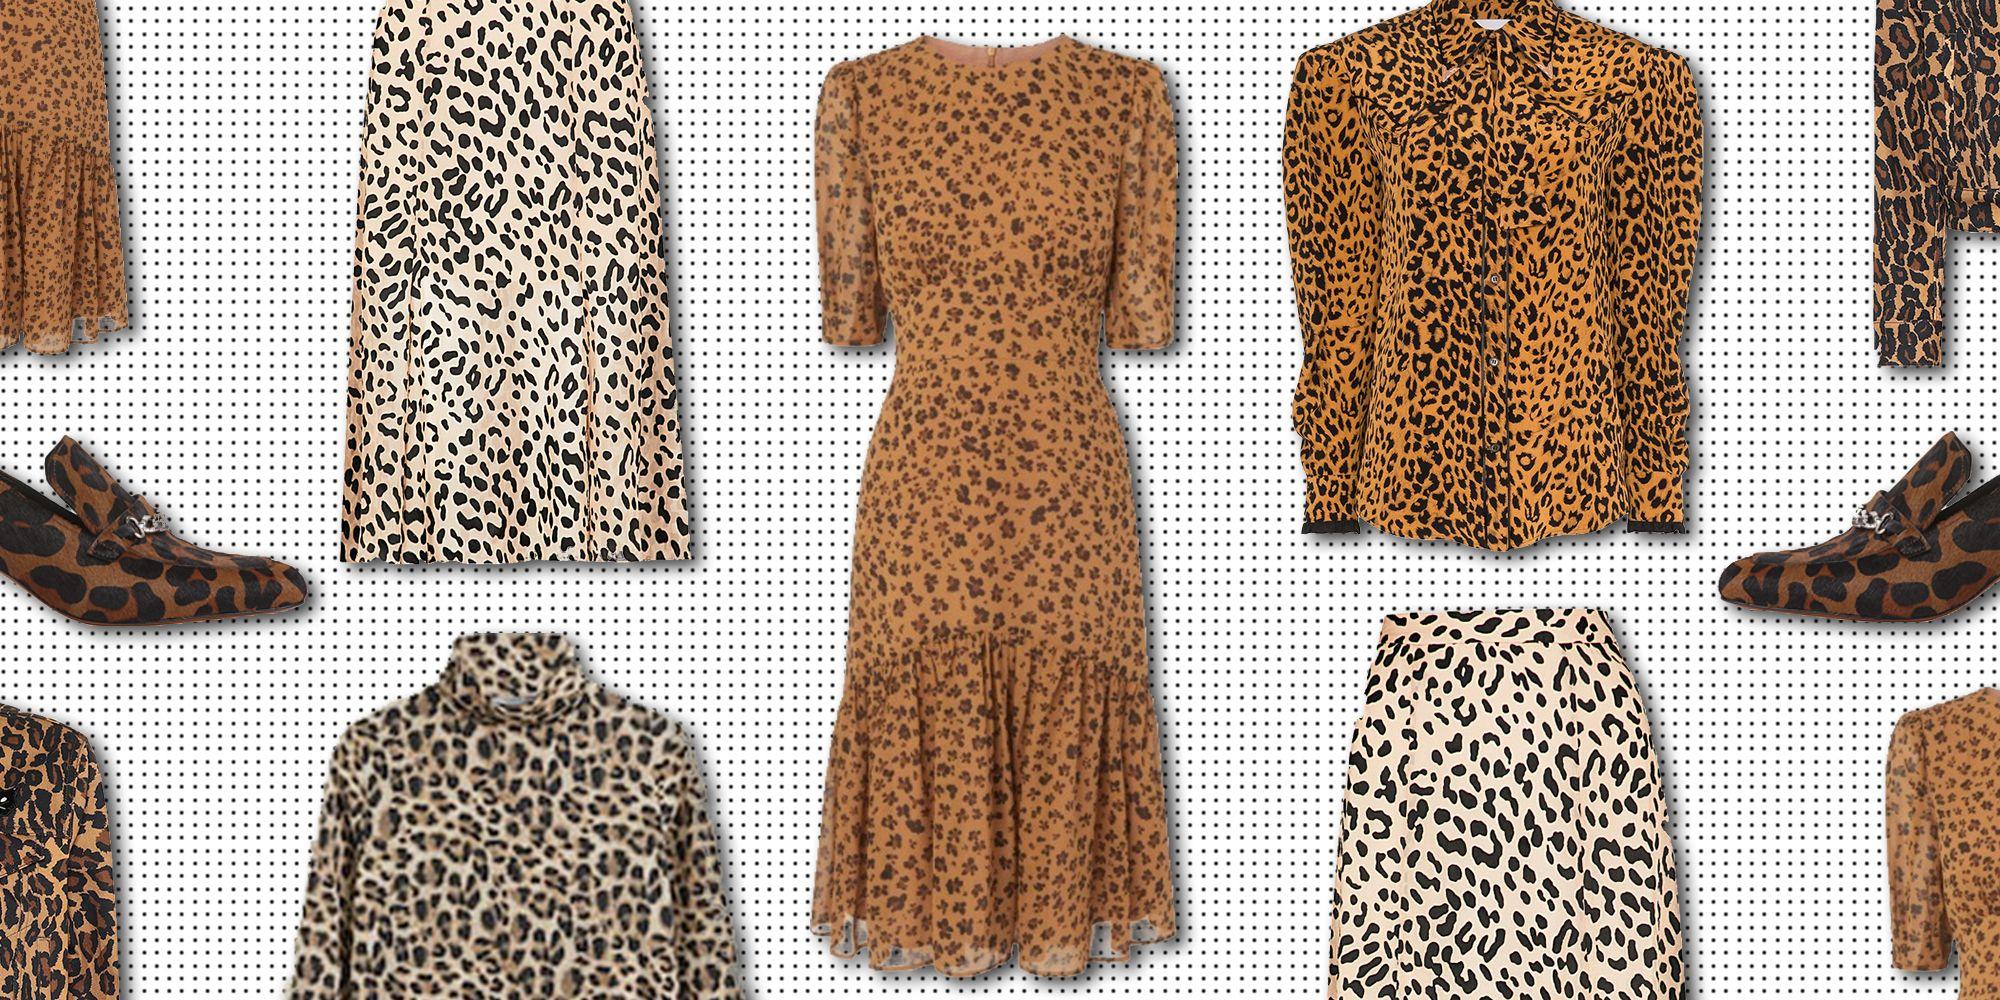 Leopard Print Pieces We're Wild About